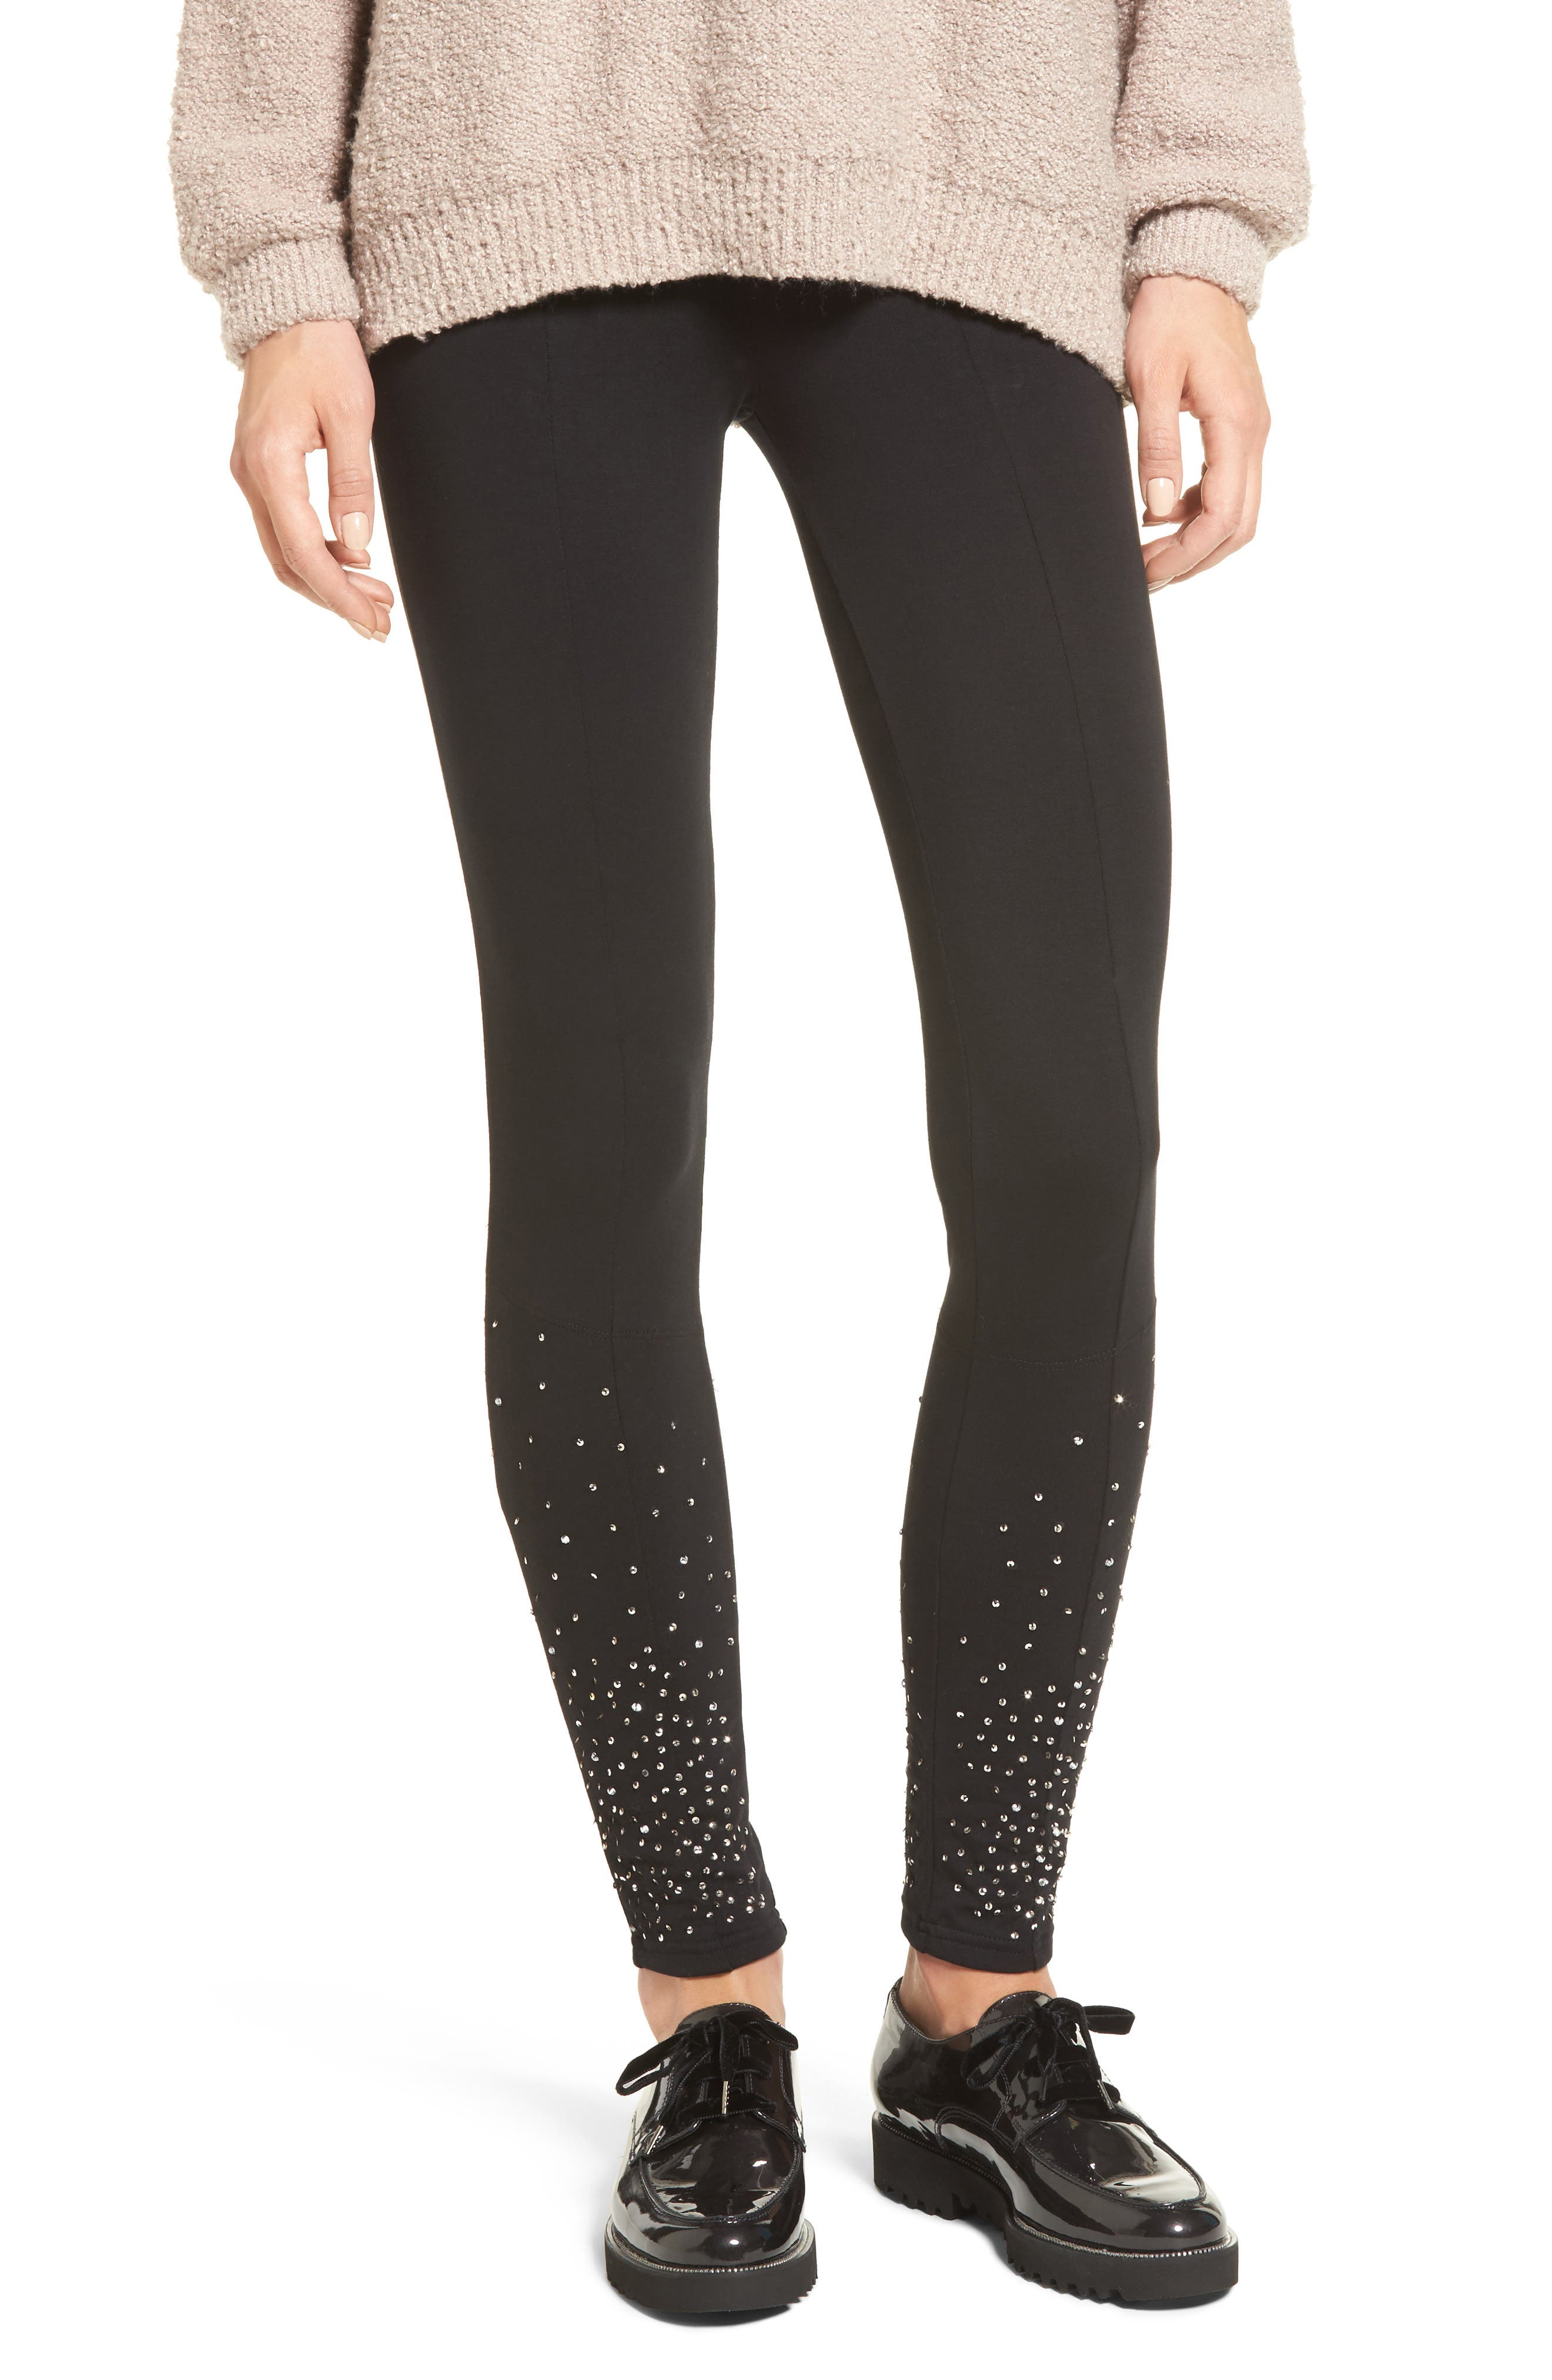 Alternate Image 1 Selected - BP. Sequin Embellished Leggings